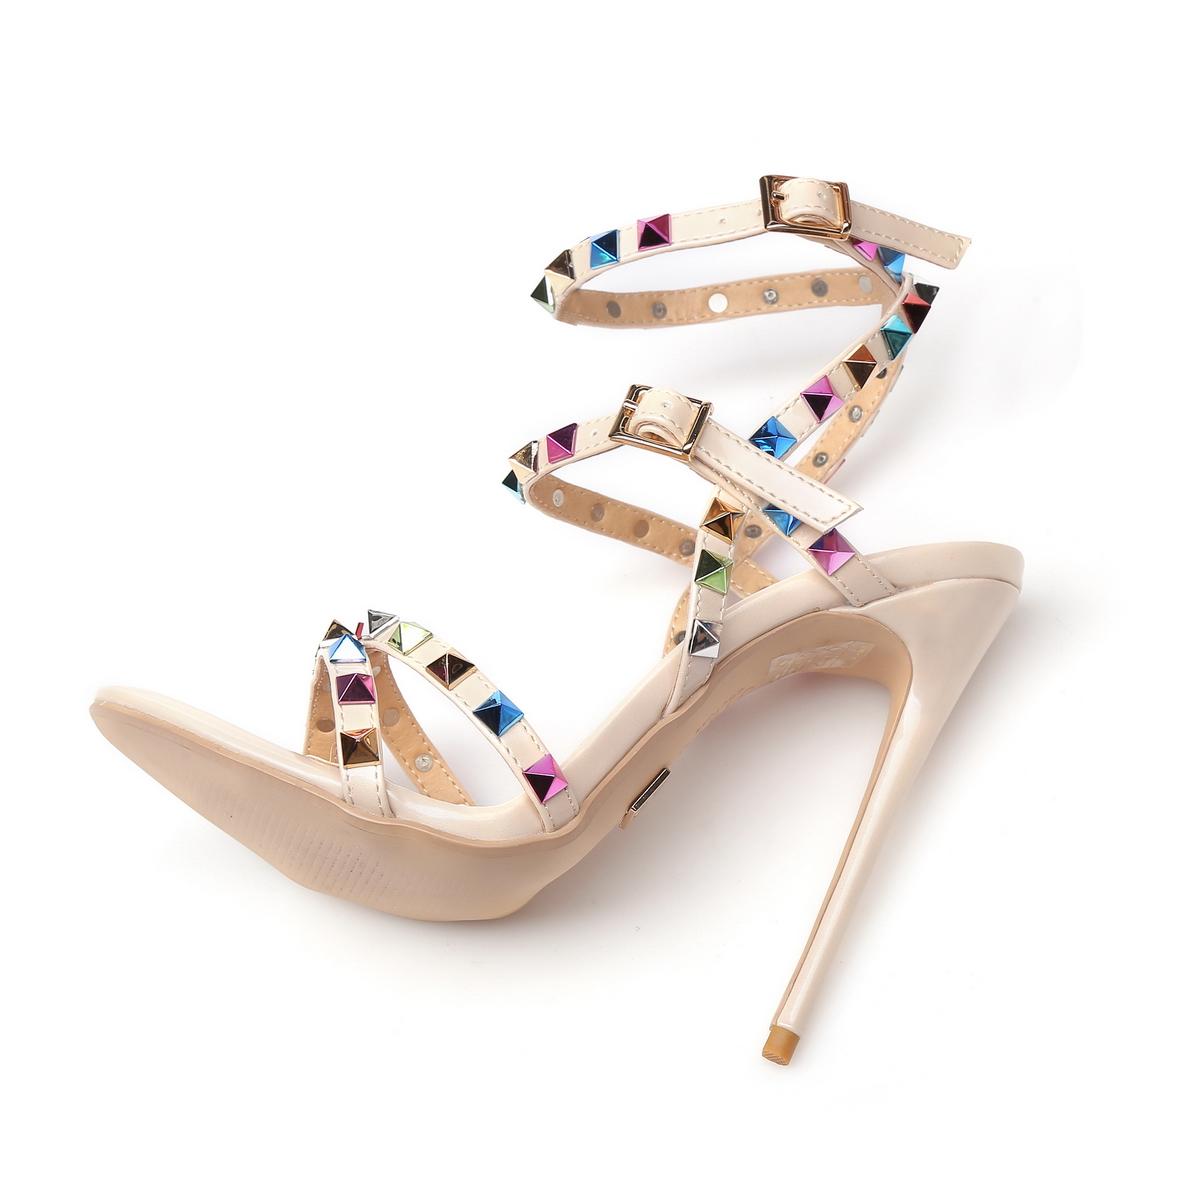 GIARO - Damen High Heel Sandalatten - Hautfarbend Schuhe in Übergrößen – Bild 5